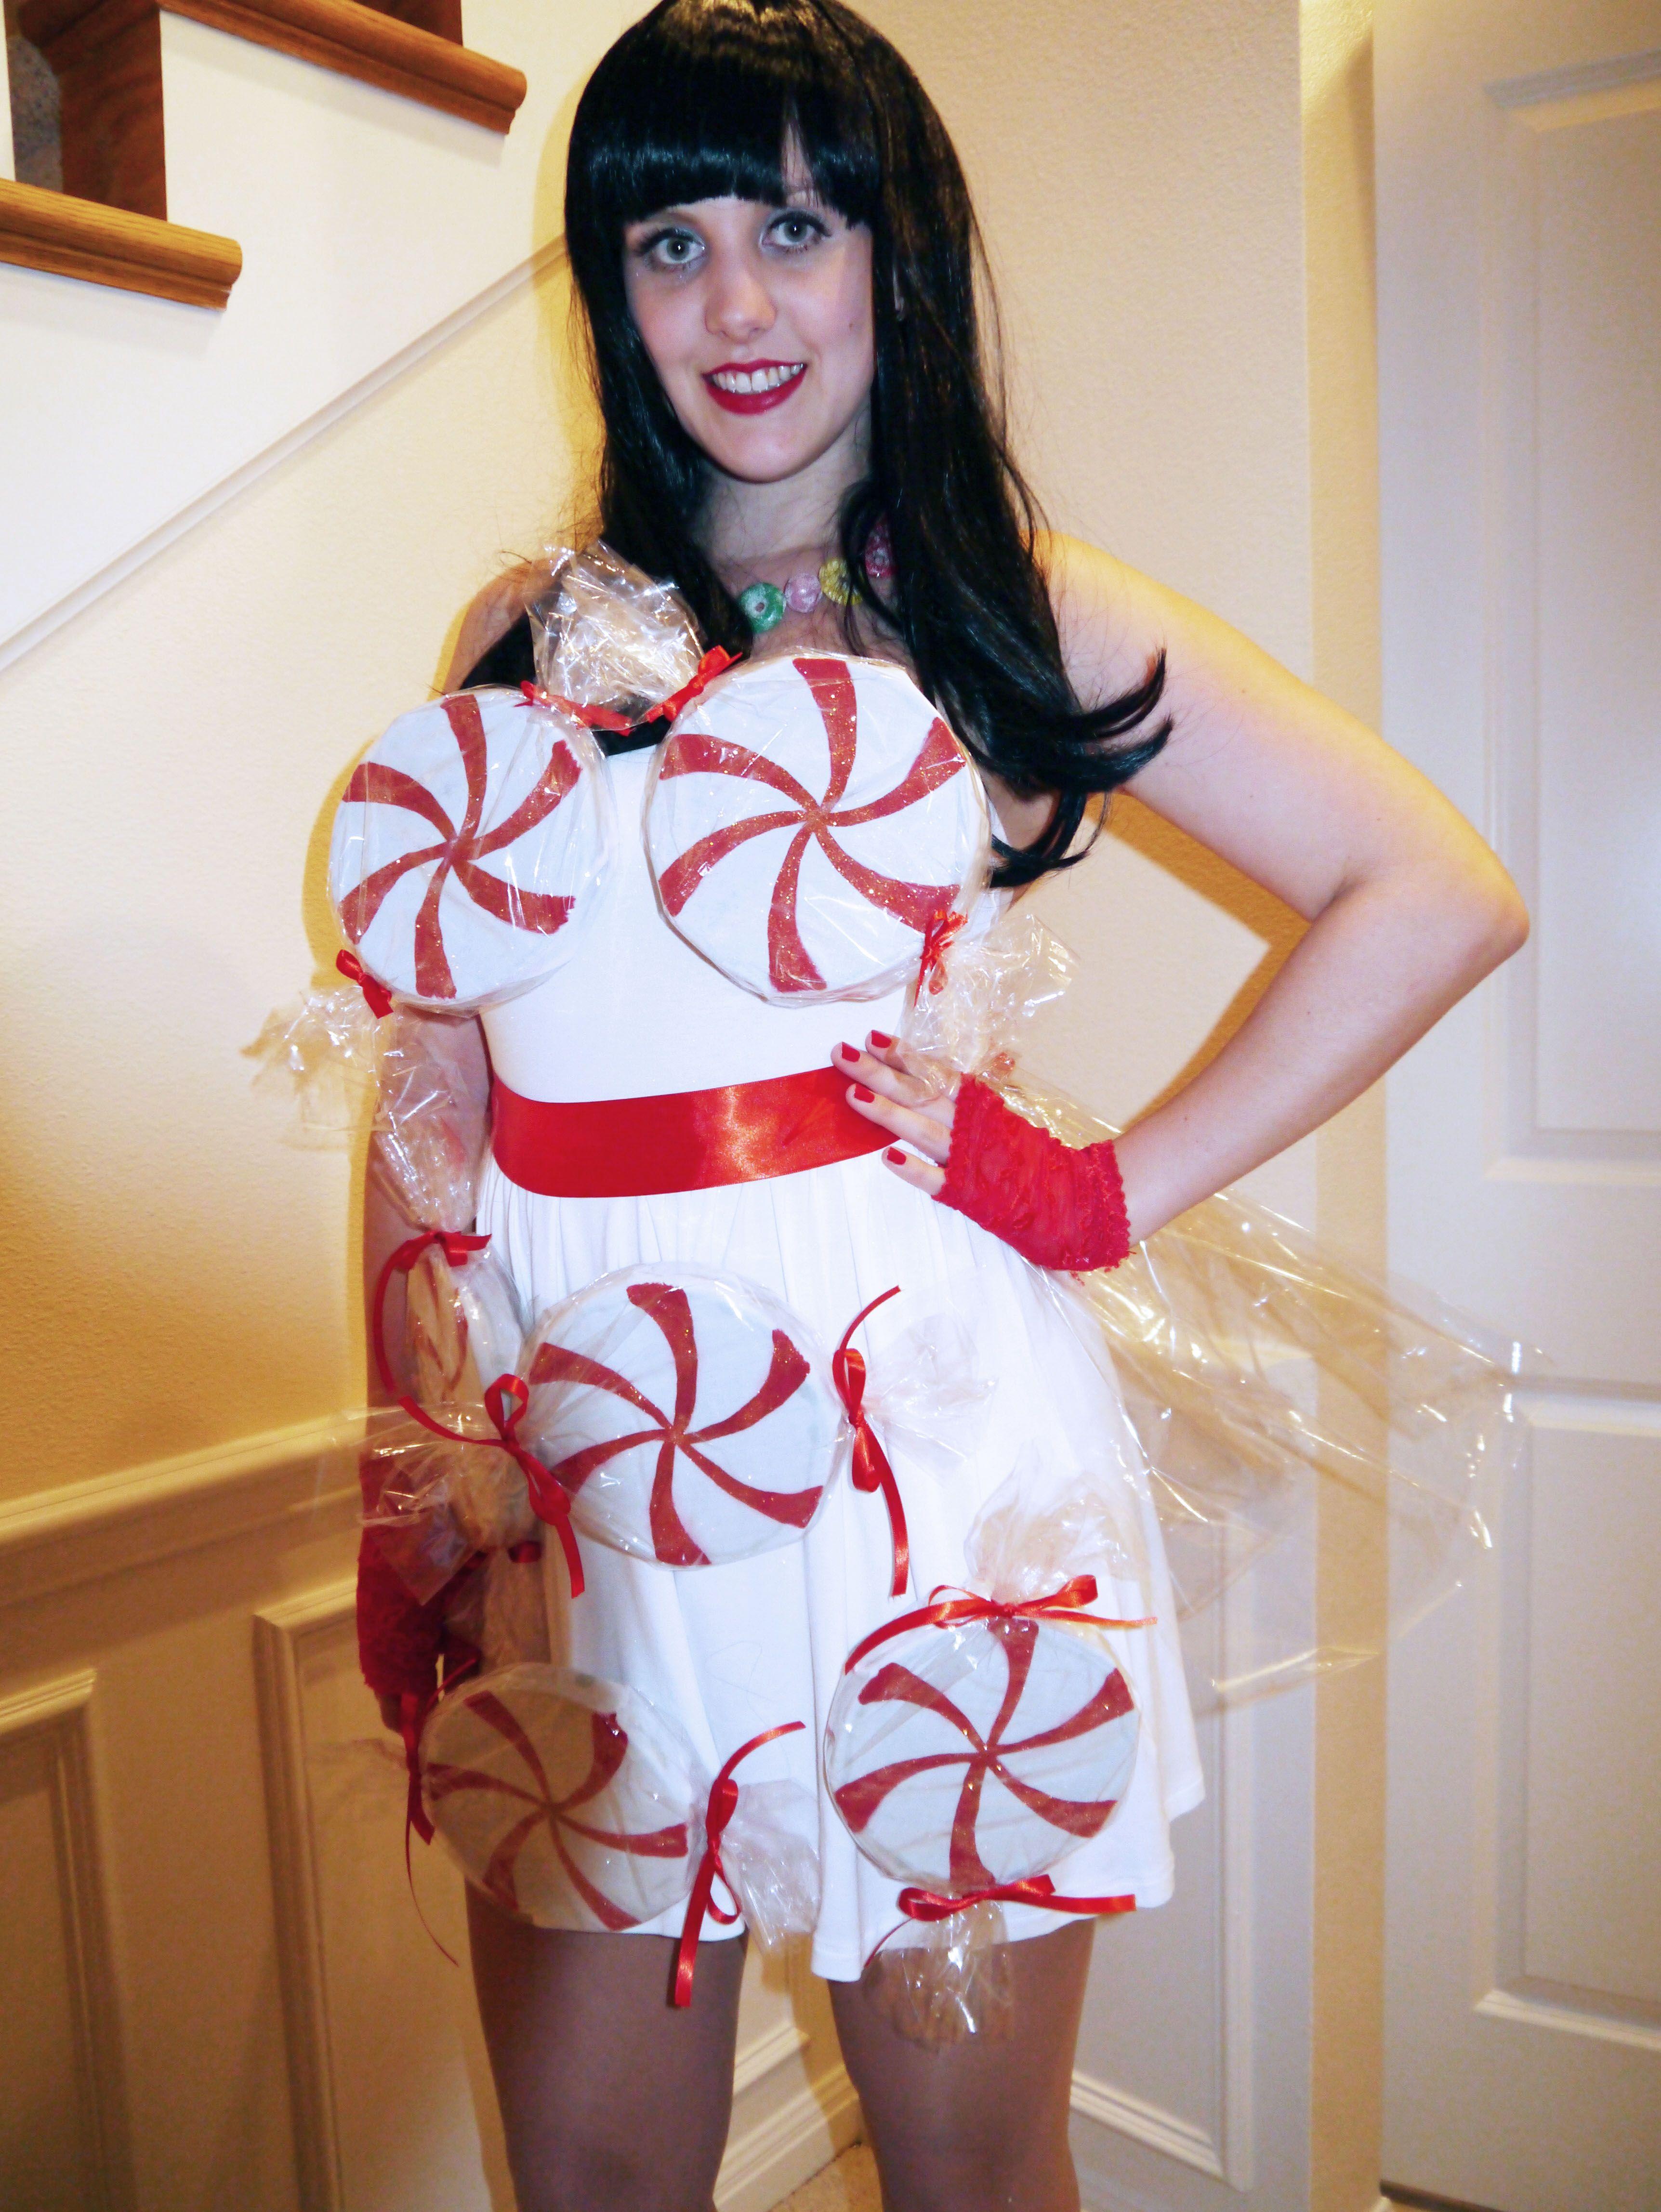 Katy Perry Homemade Halloween Costume | M Y O U T F I T S ...